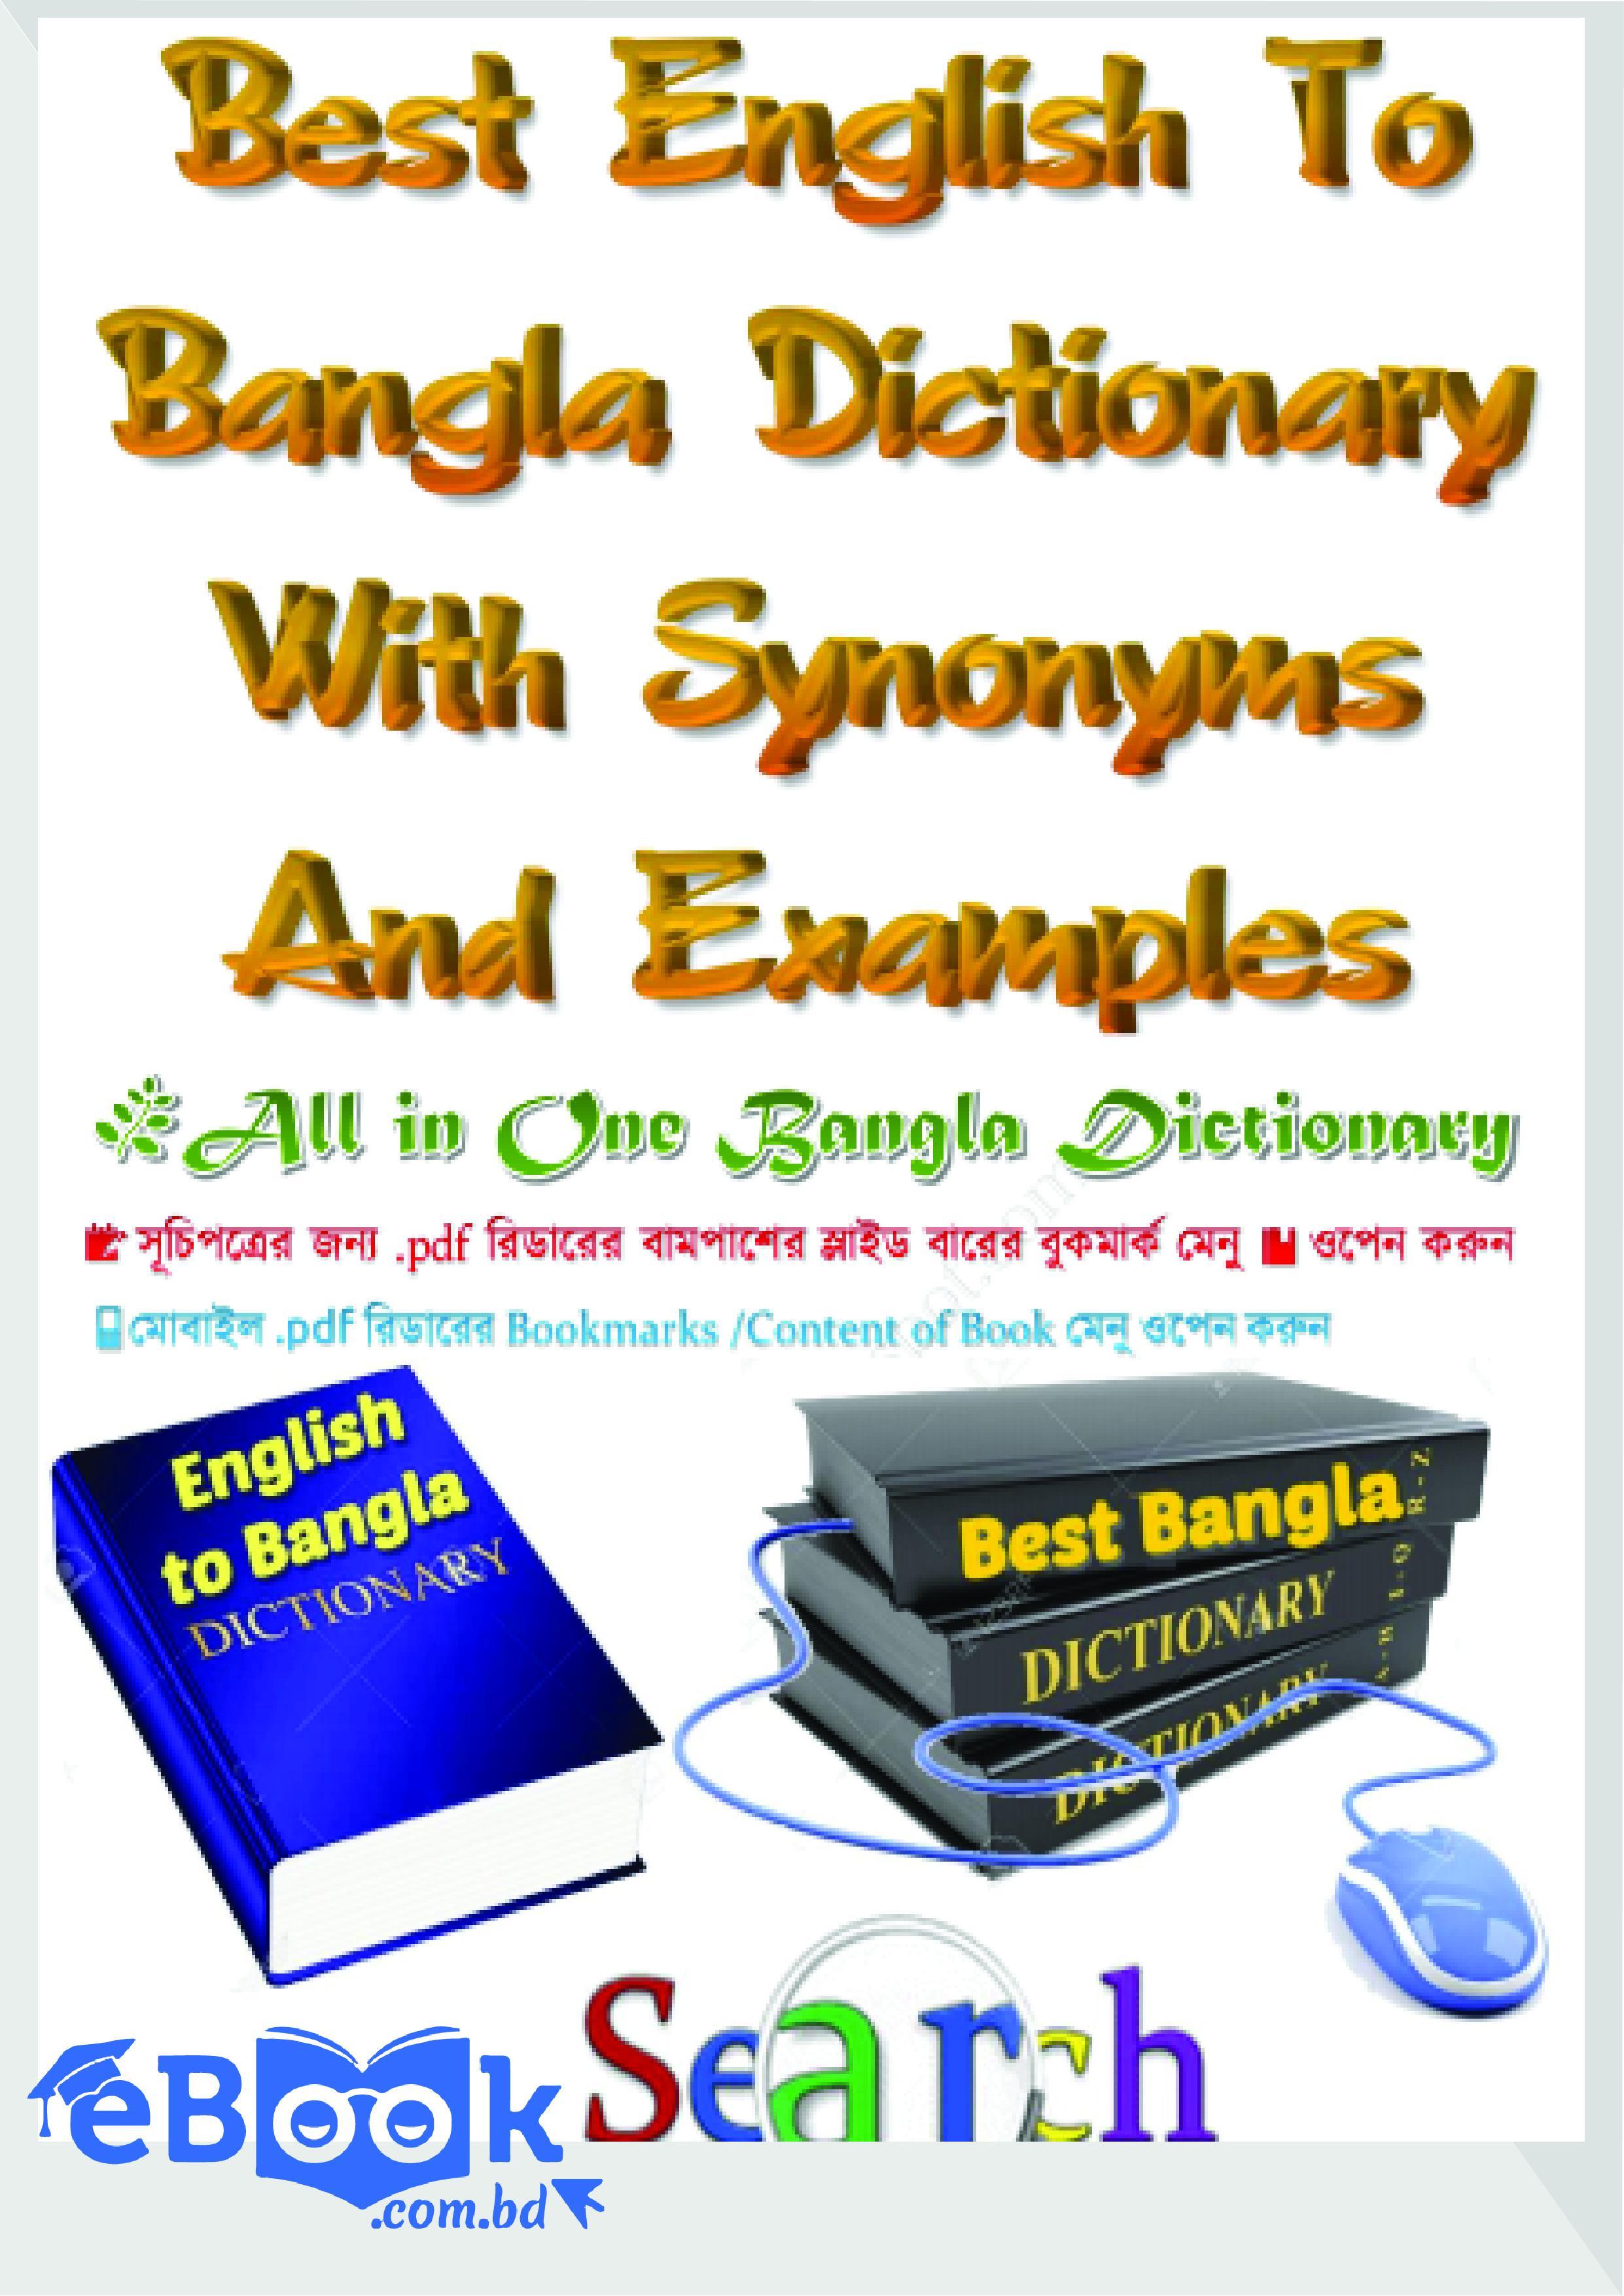 Best English To Bangla Dictionary With Synonyms And Examples - সেরা ইংরেজি থেকে বাংলা অভিধান সাথে একীধরনের শব্দের অর্থ এবং উদাহরণ